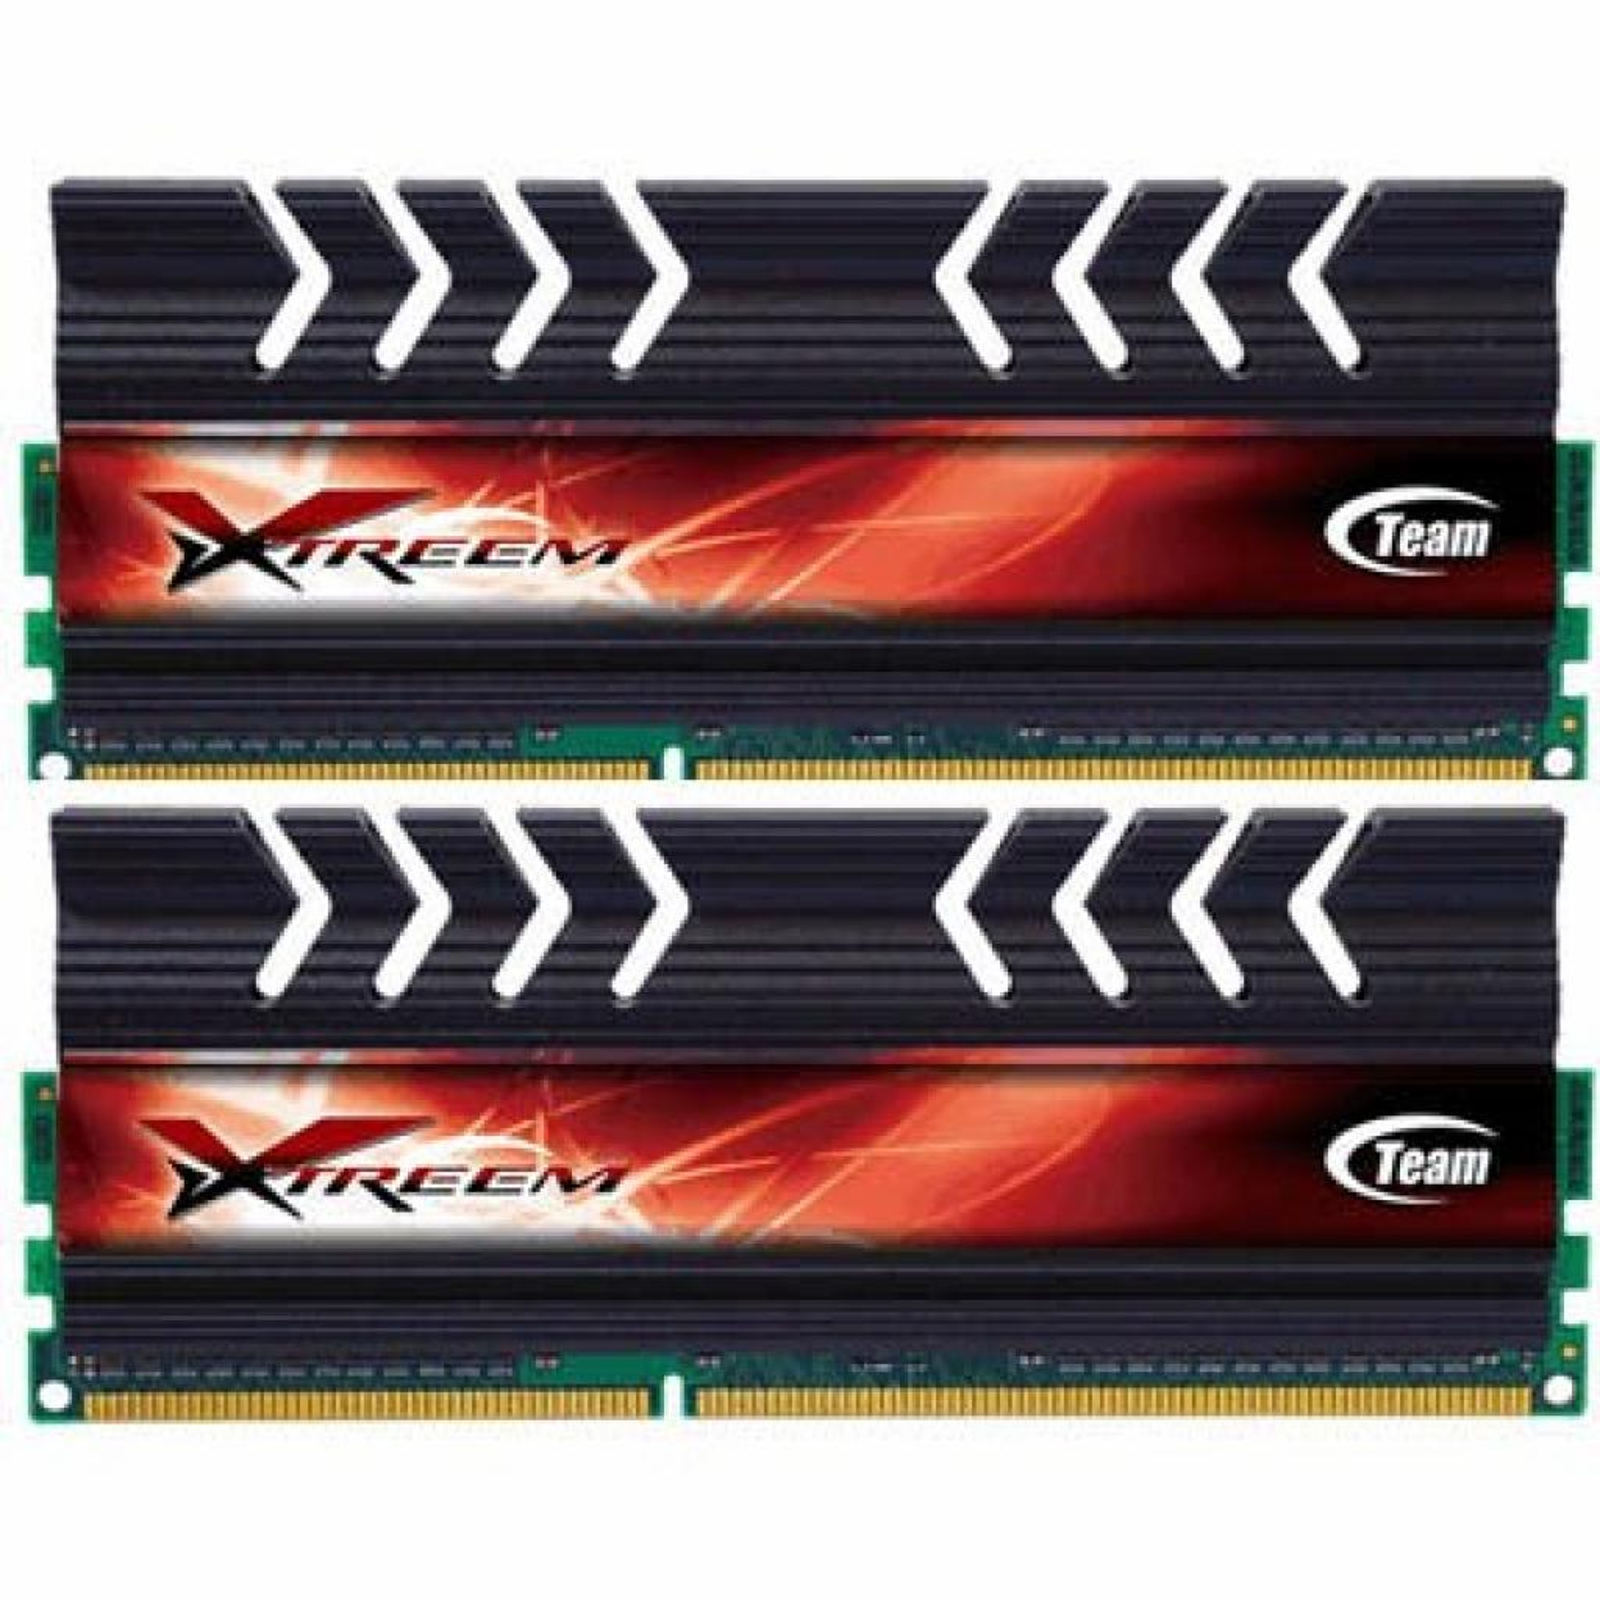 Модуль памяти для компьютера DDR3 8GB (2x4GB) 2400 MHz Team (TXD38G2400HC10QDC01)